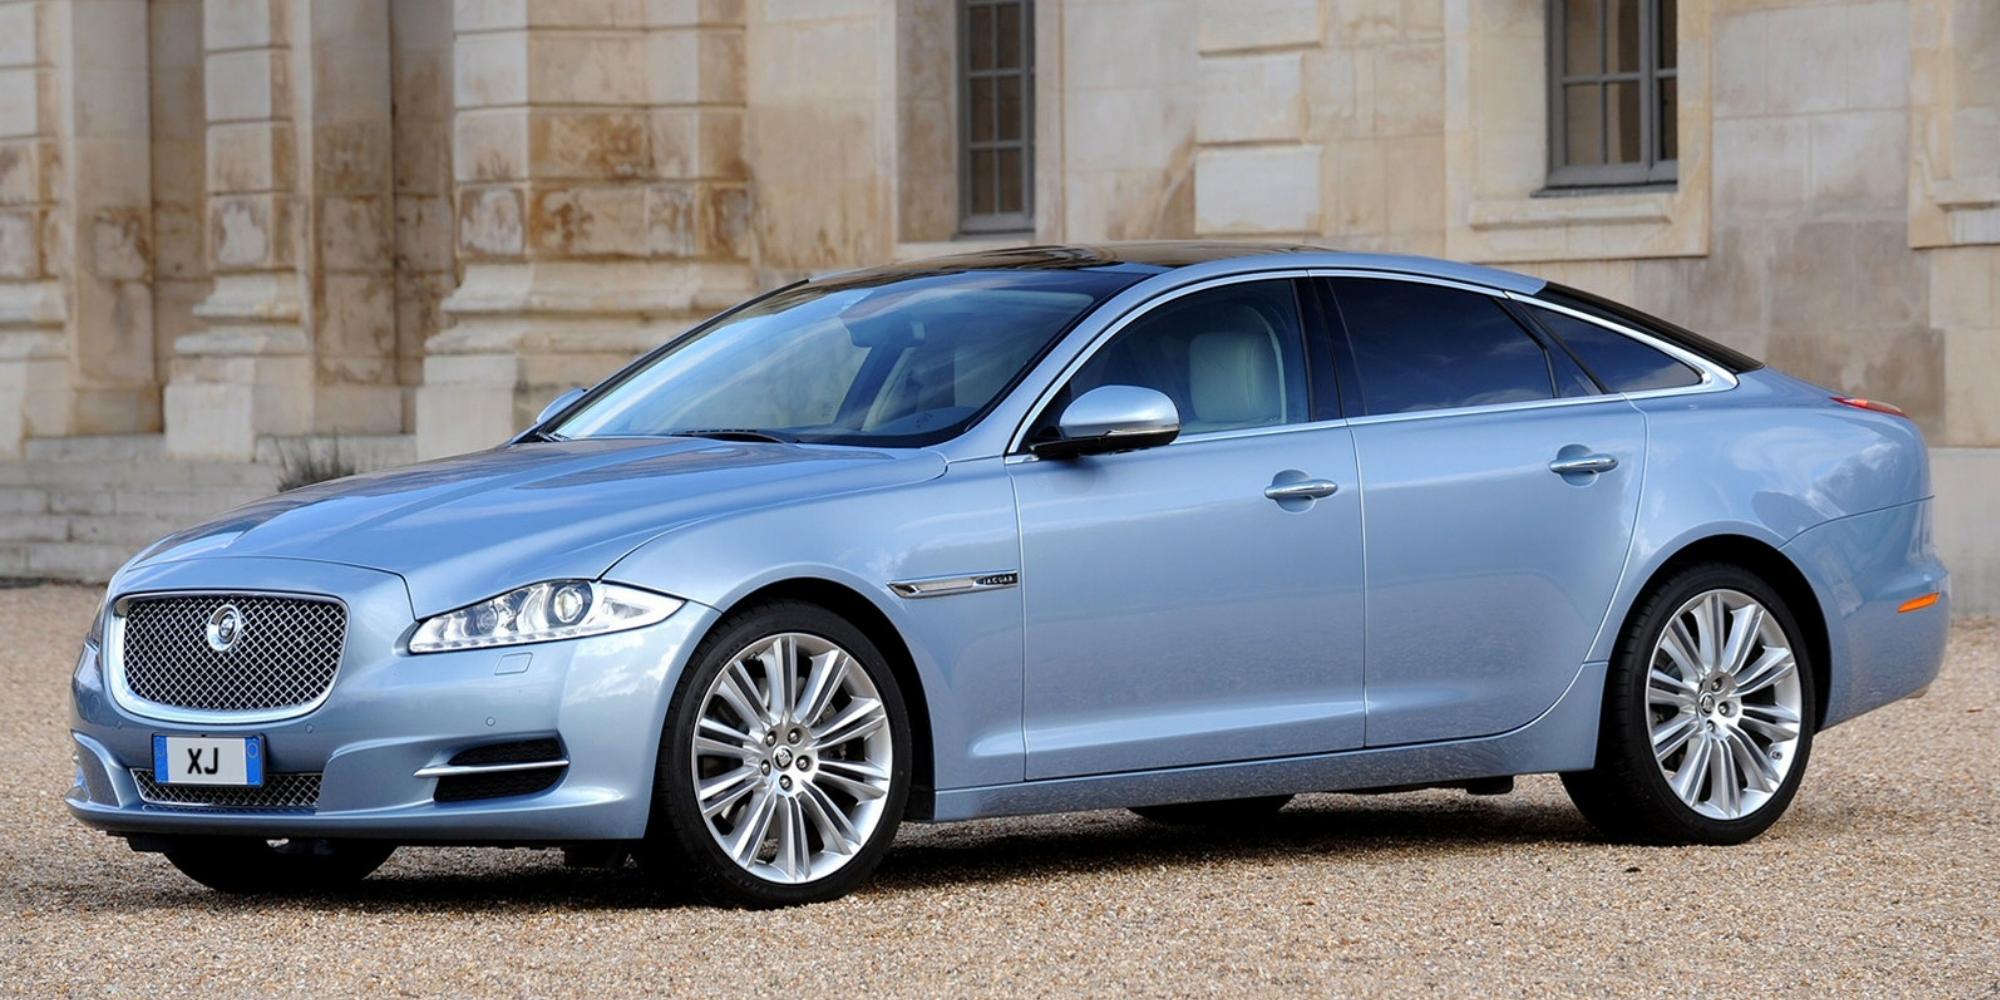 XJ Standard Wheelbase Premuim Luxury